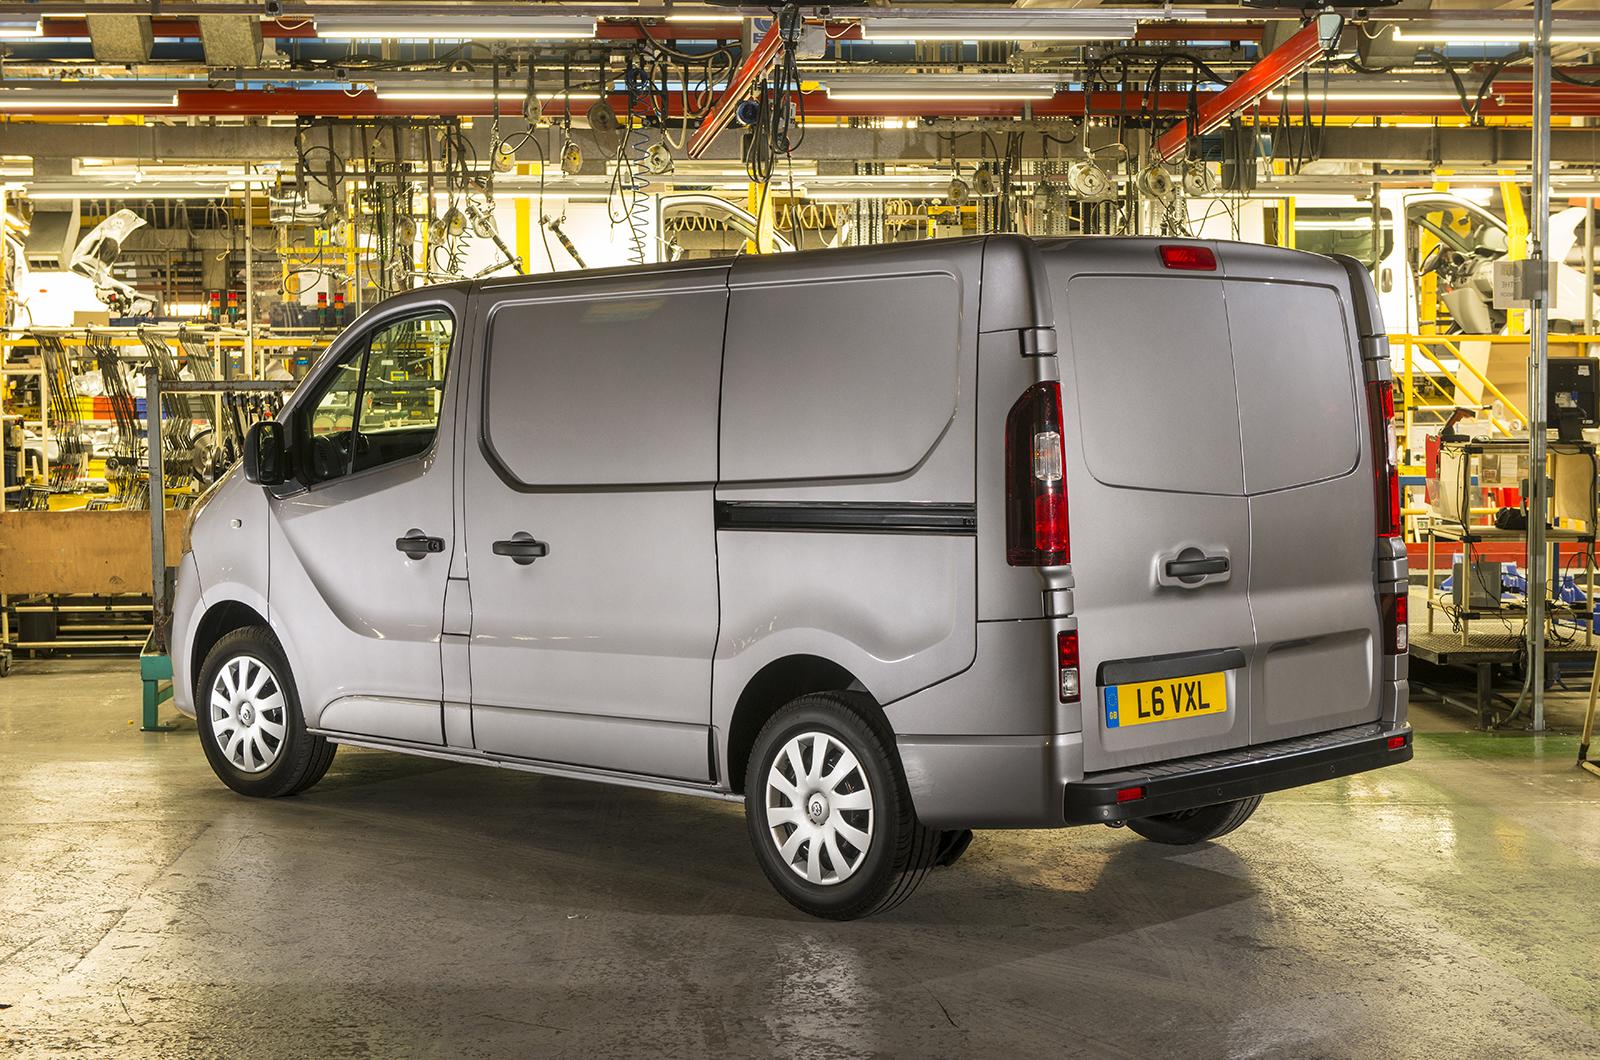 2014 [Renault/Opel/Fiat/Nissan] Trafic/Vivaro/Talento/NV300 - Page 4 Vauxhall-van-45